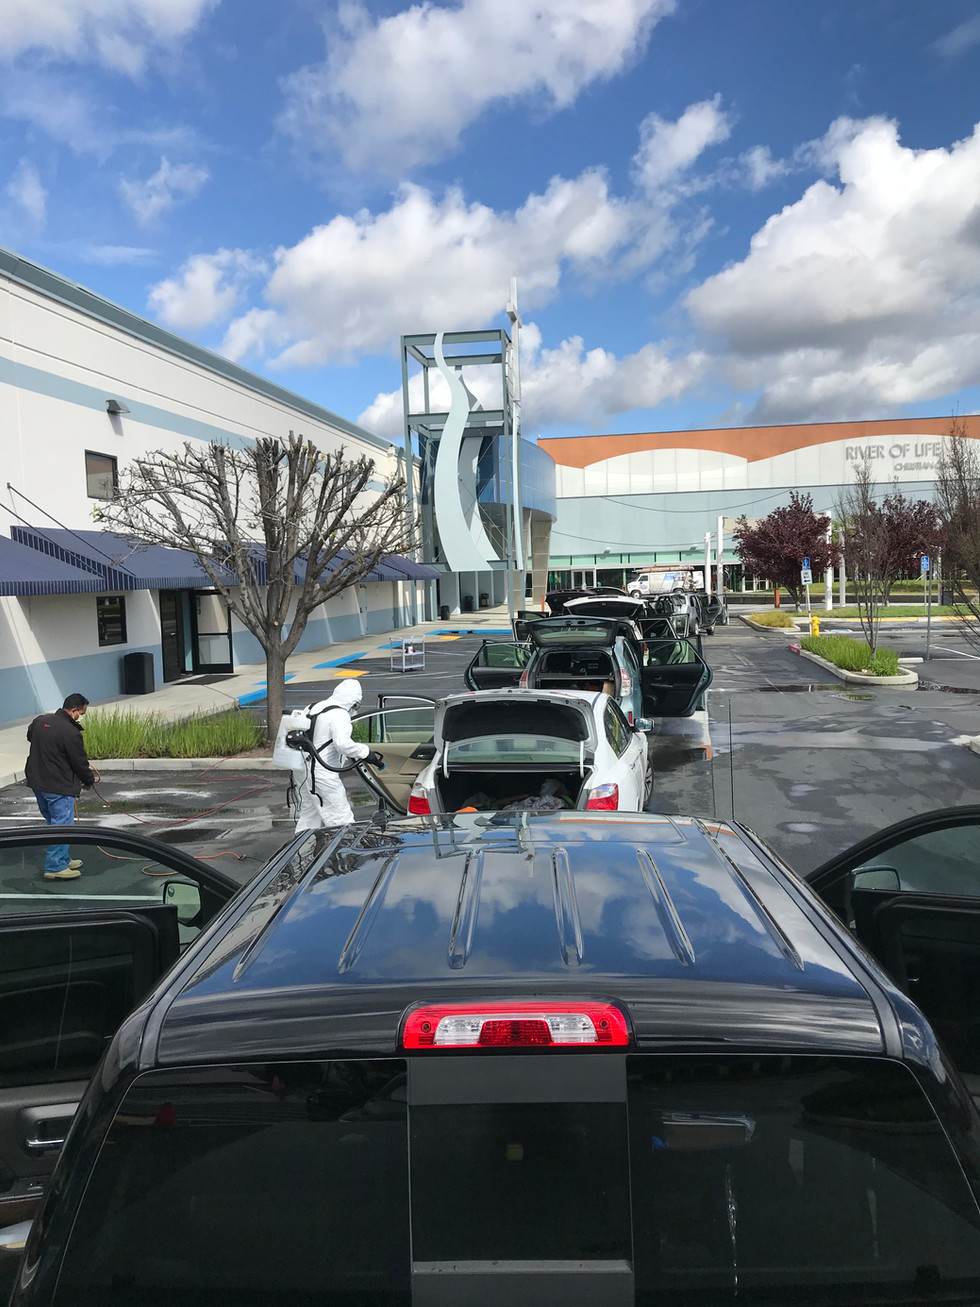 Car Disinfacting service Bay area